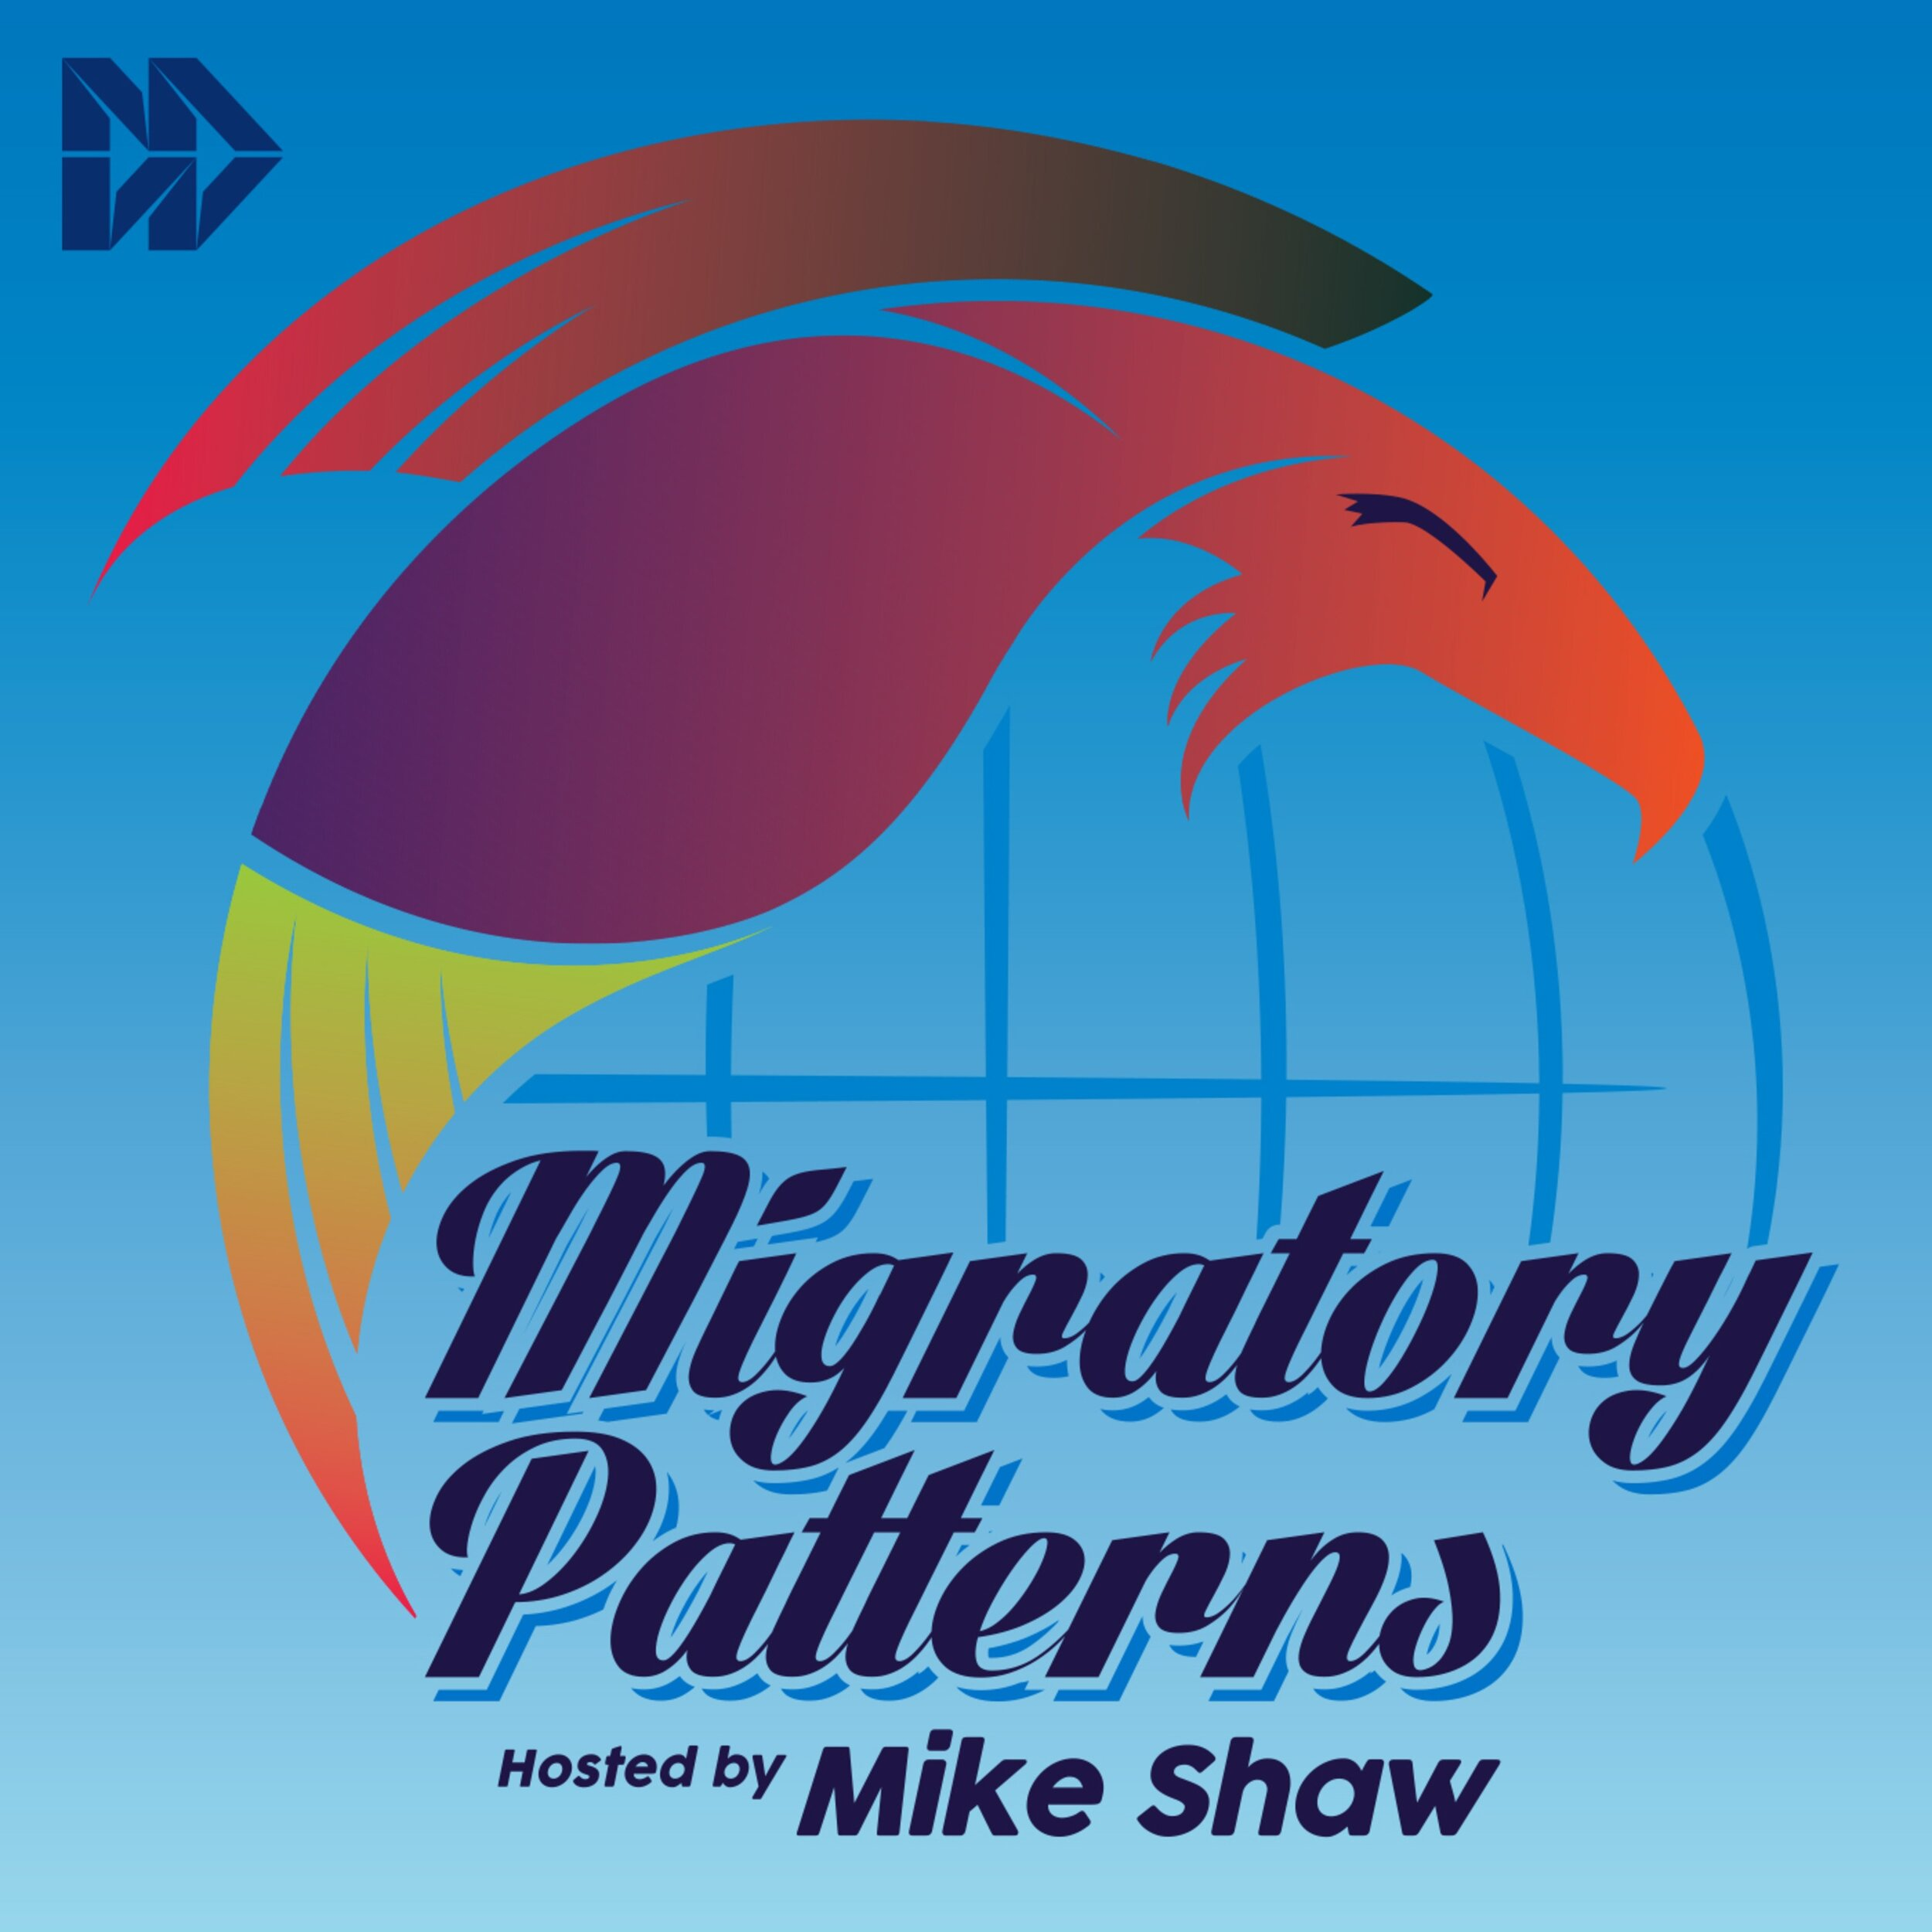 Migratory Patterns Logo.jpg